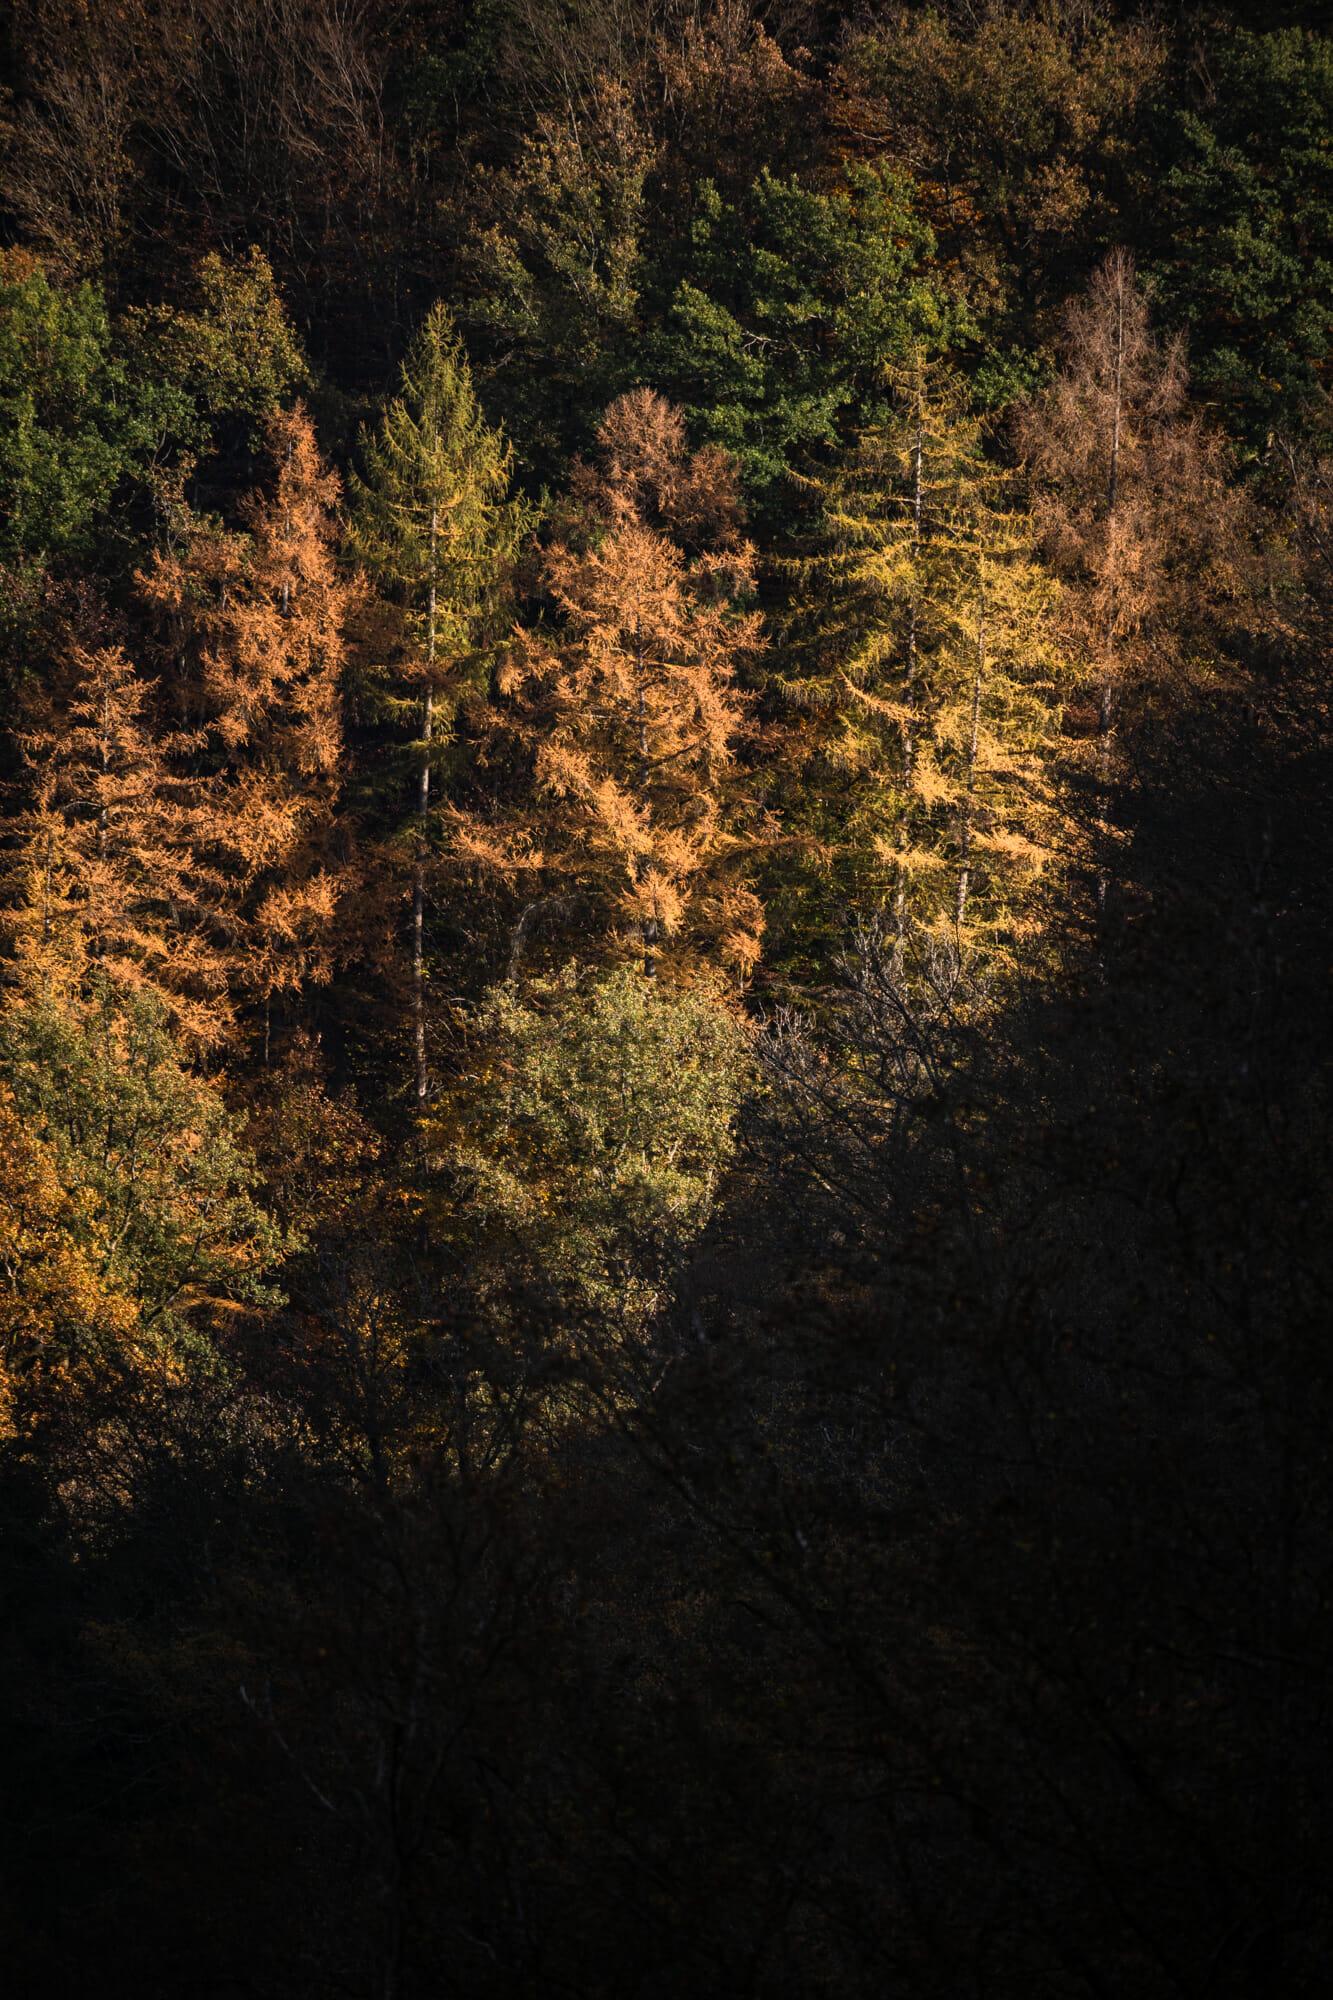 Forêt vallée de la Semois